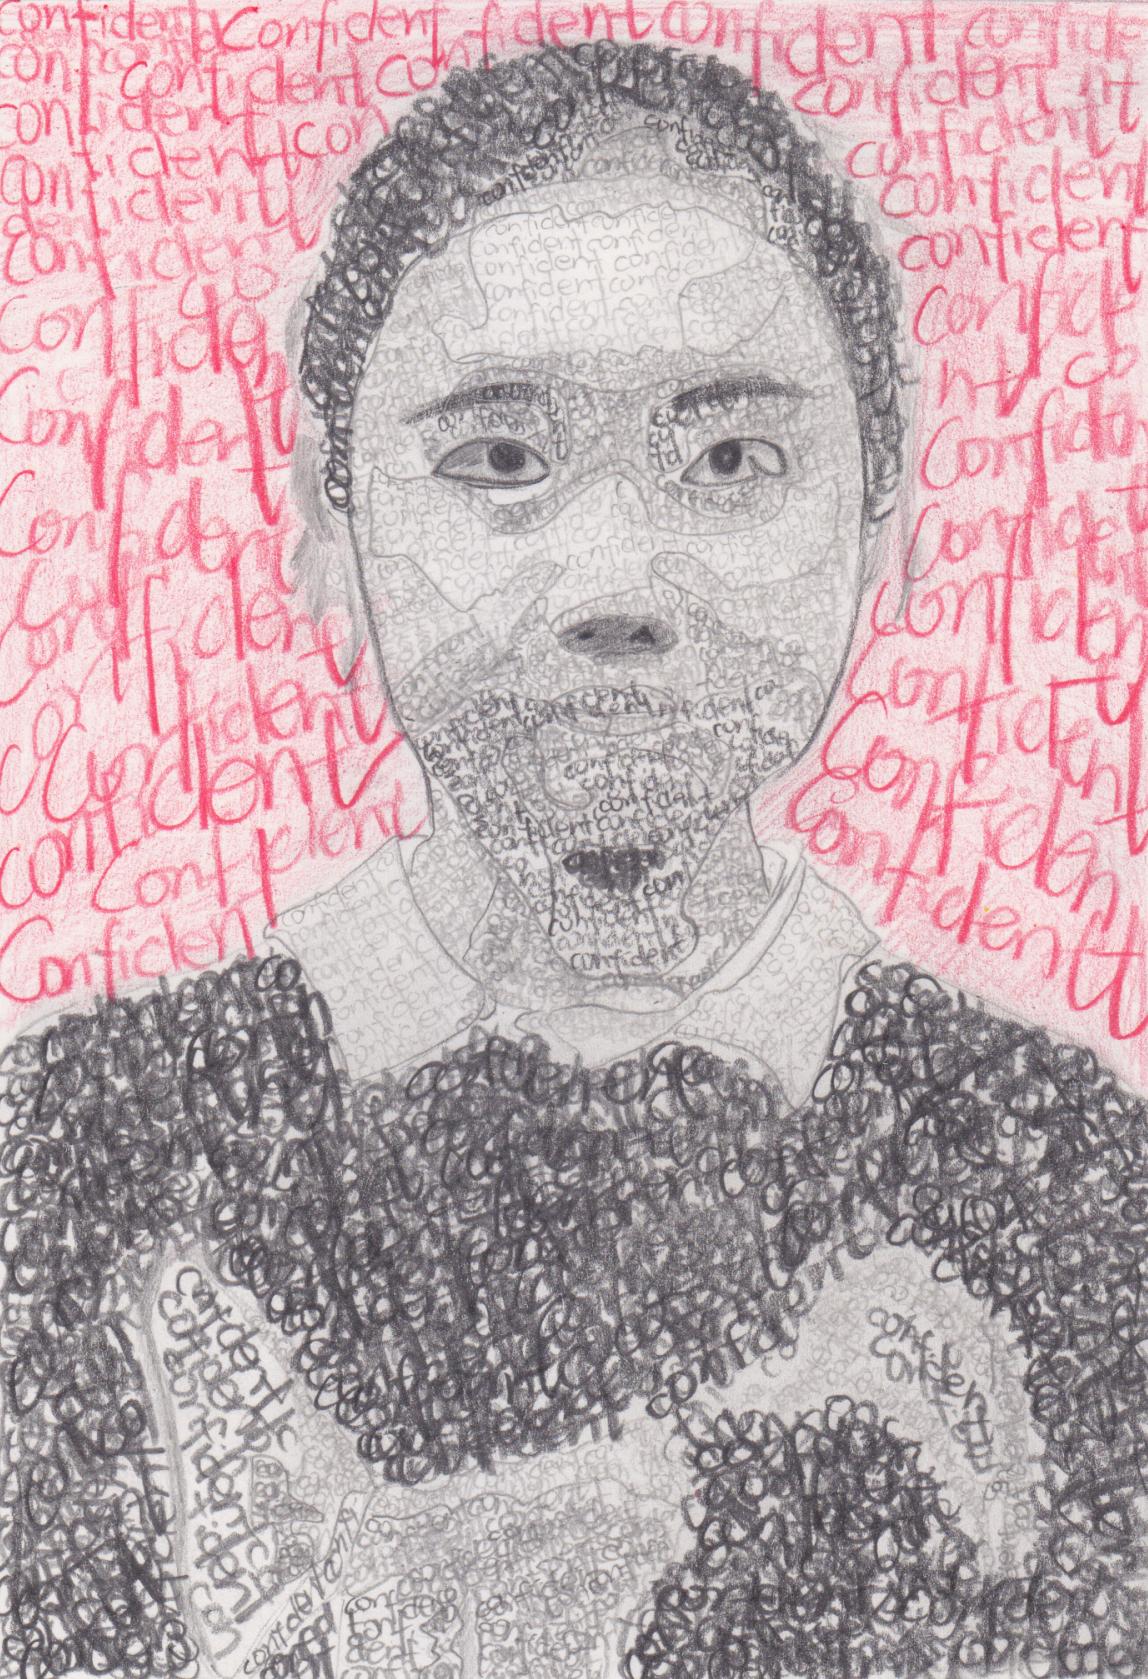 LiuFei_Text Portrait_Furness.jpg